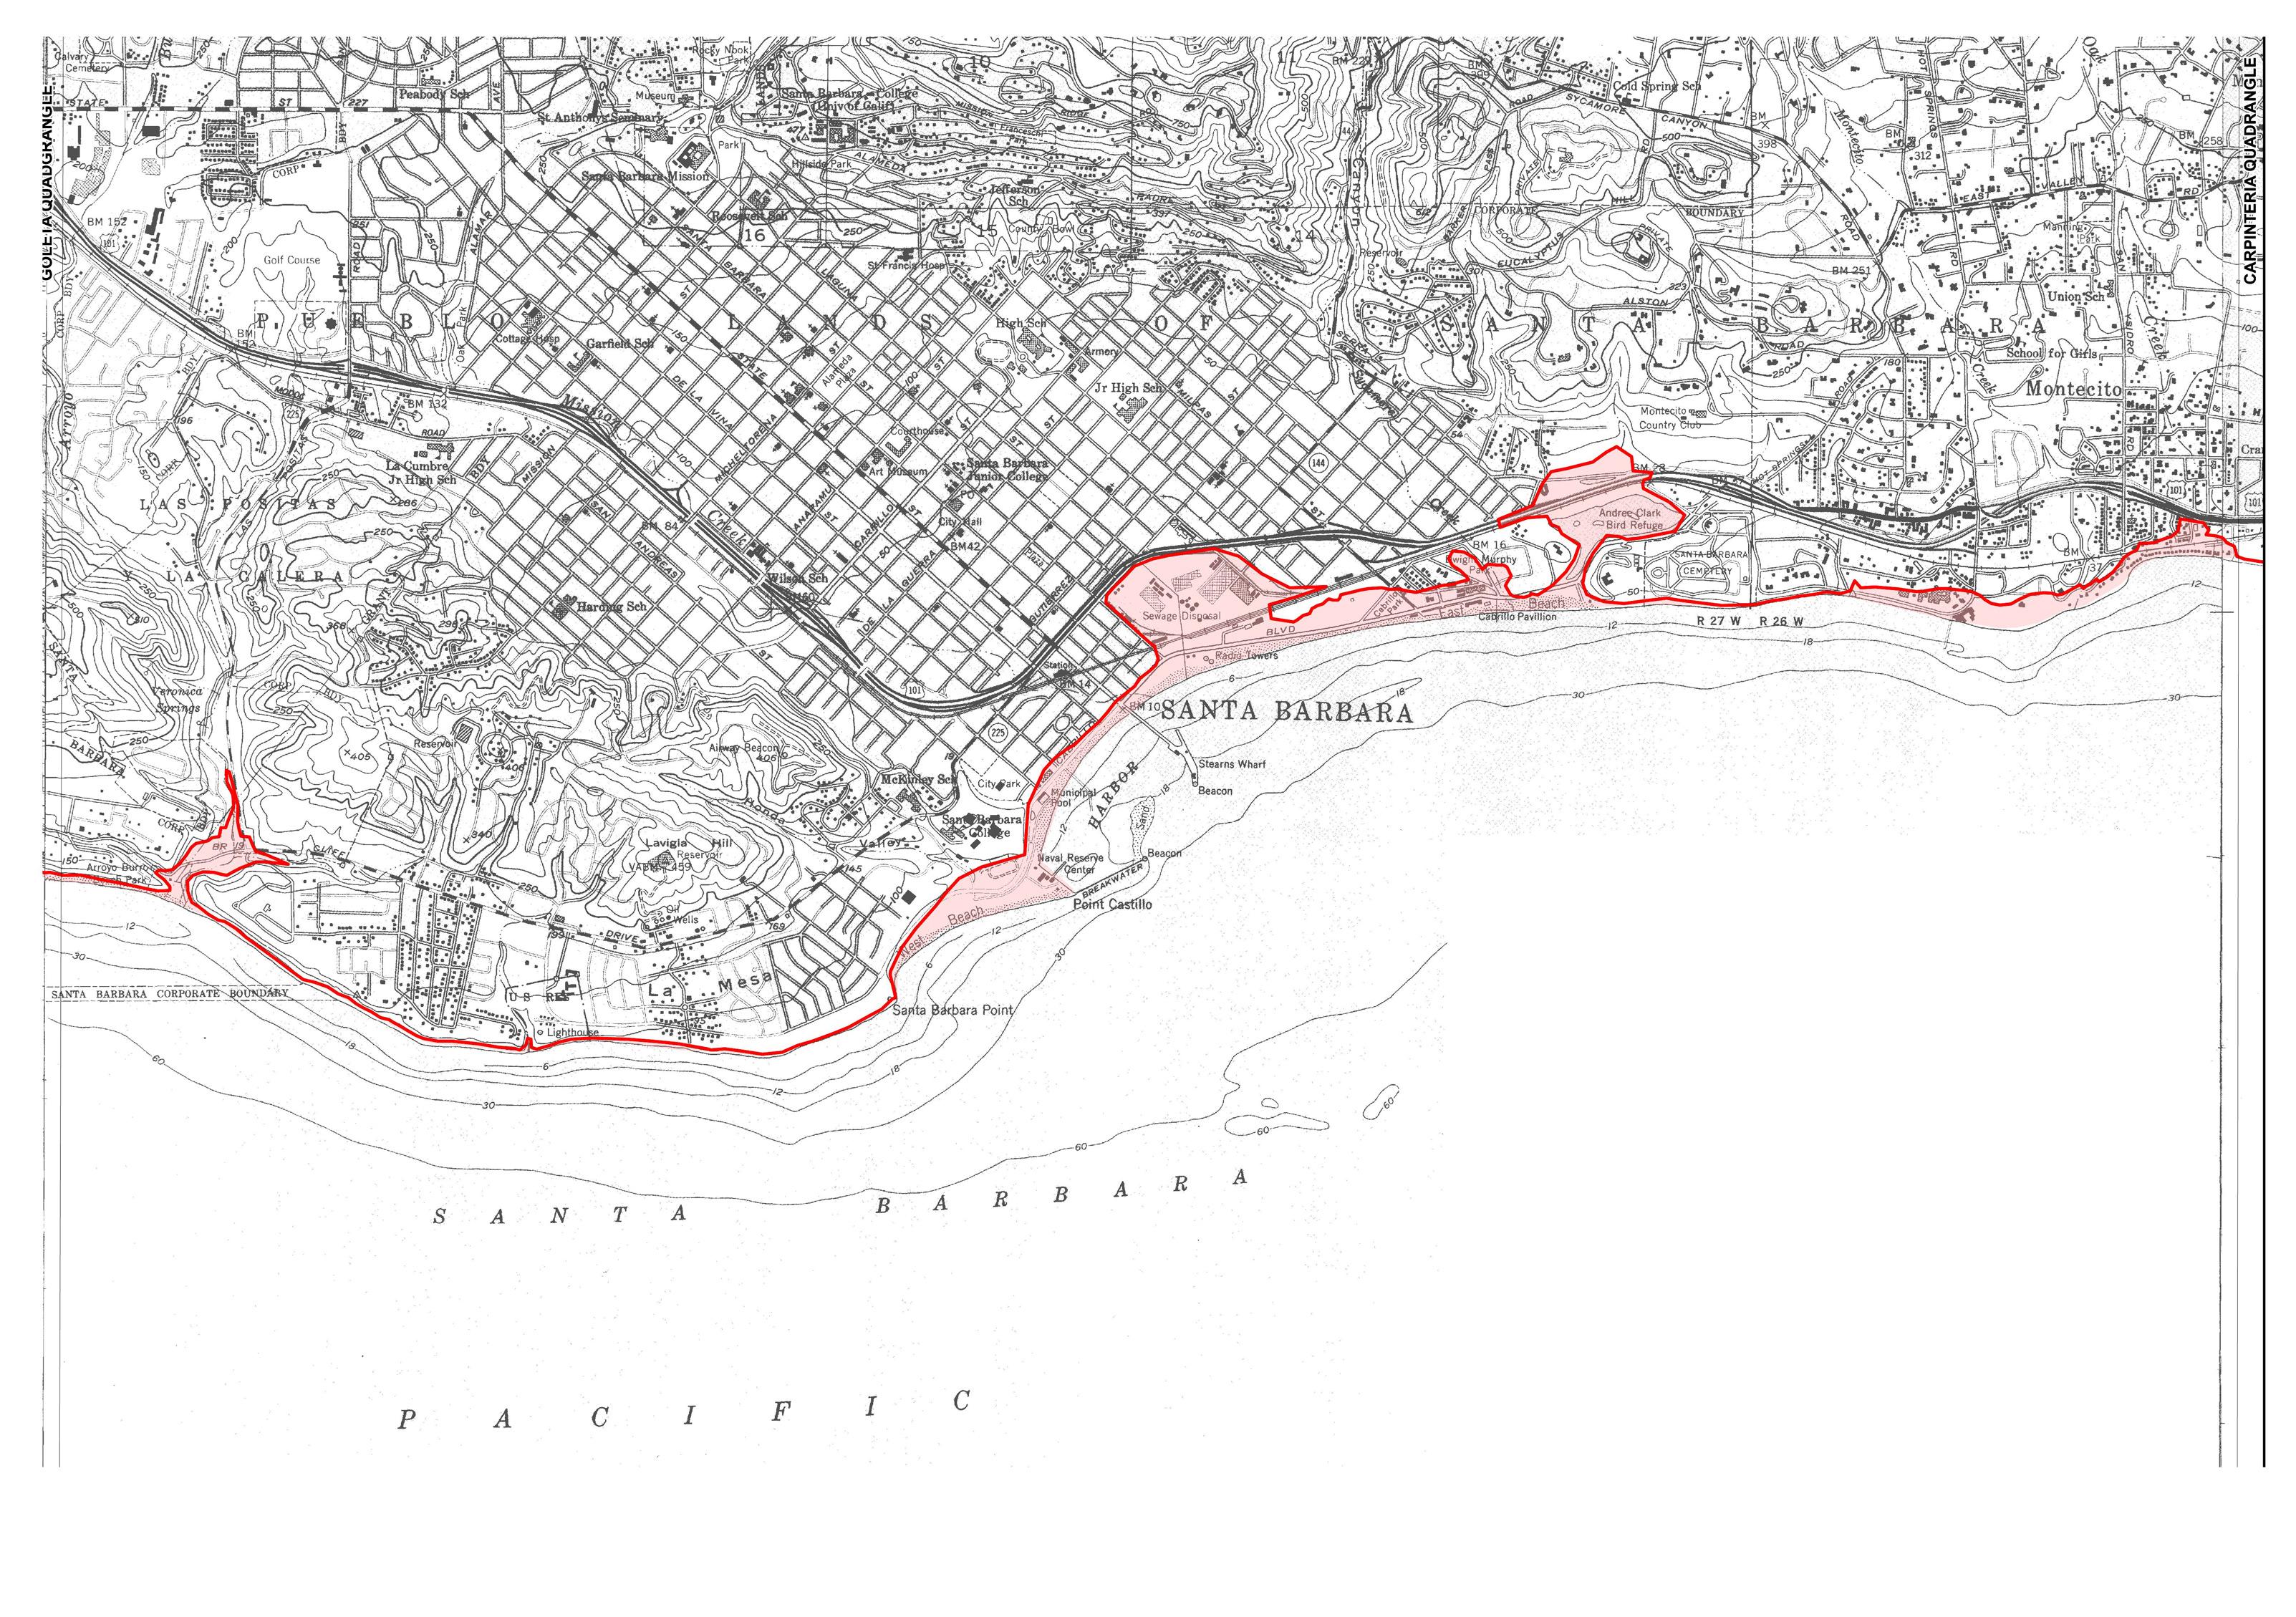 Potential Earthquake Worries in Santa Barbara Channel - The Santa